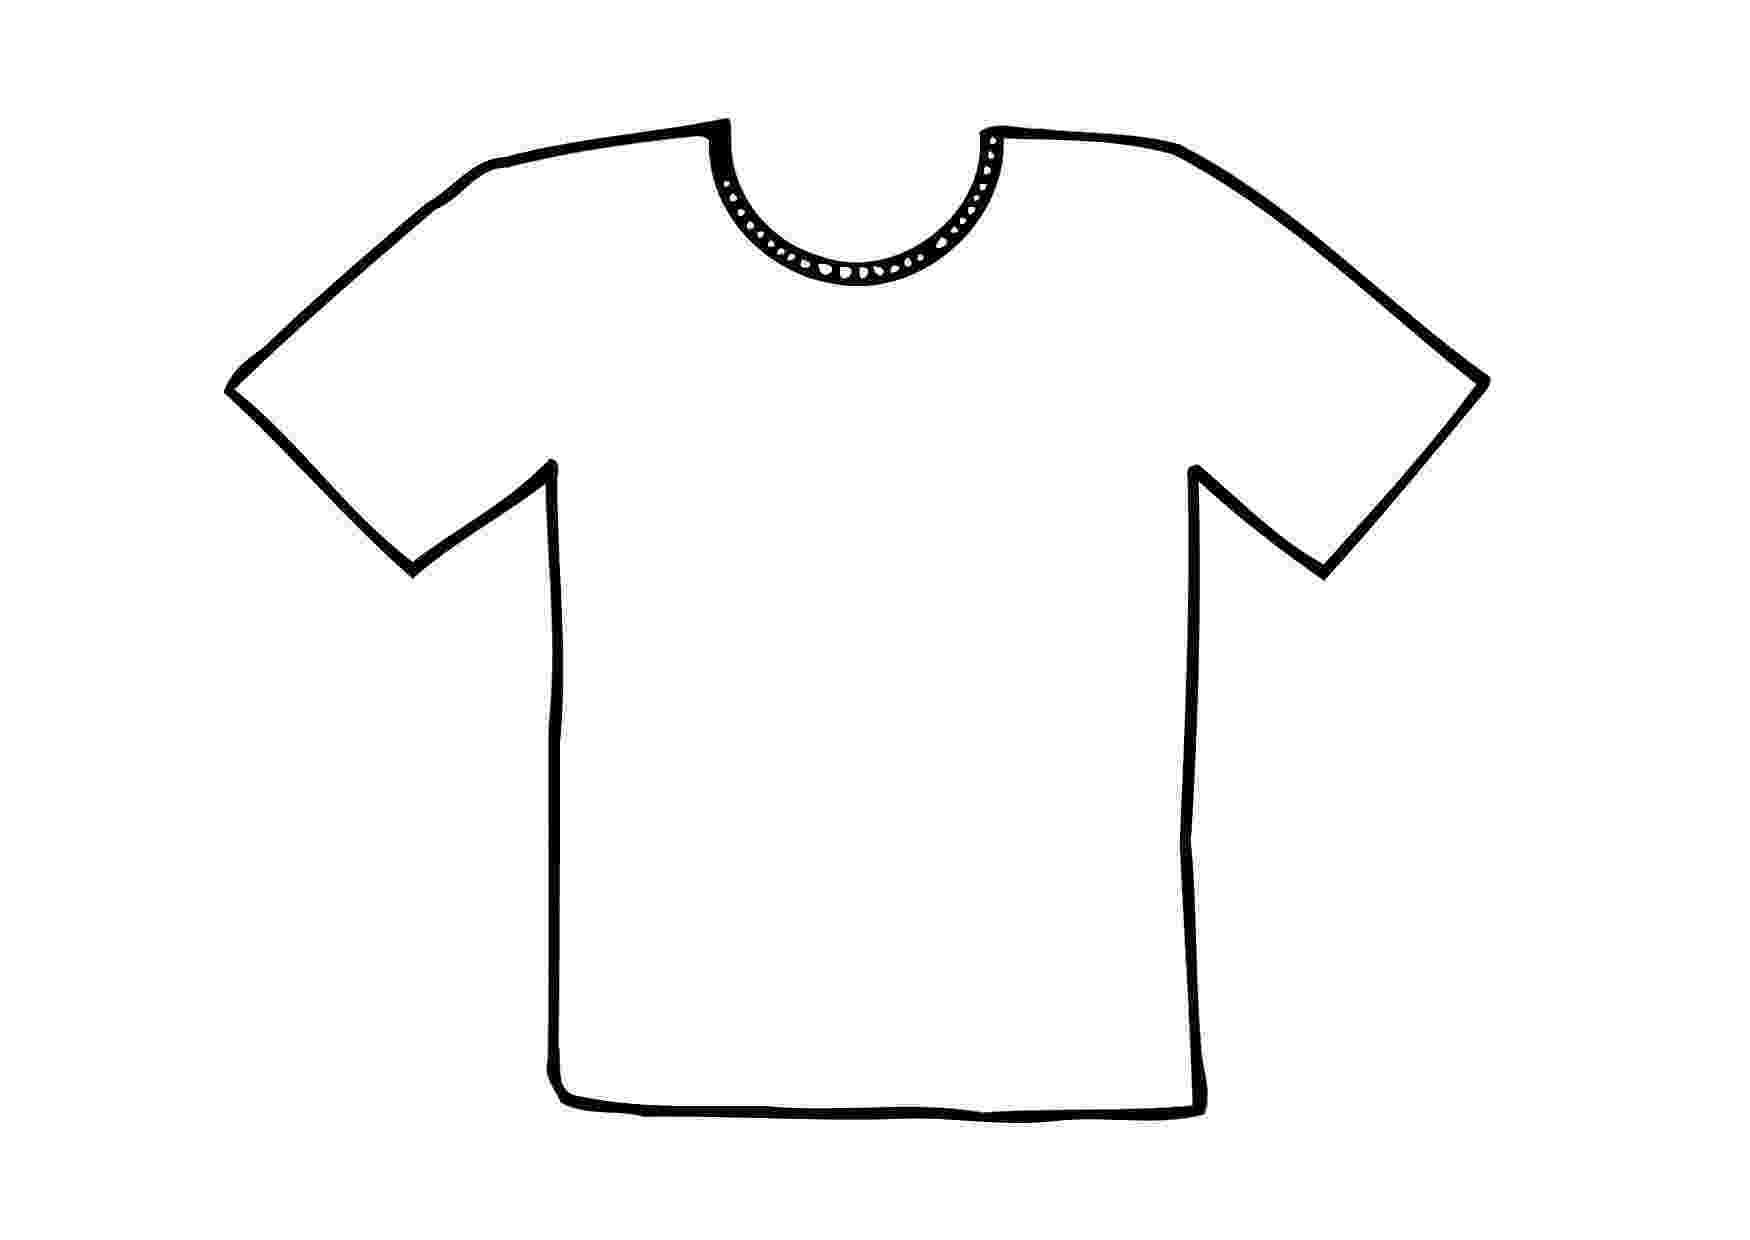 coloring book shirt men shirt coloring page book shirt coloring